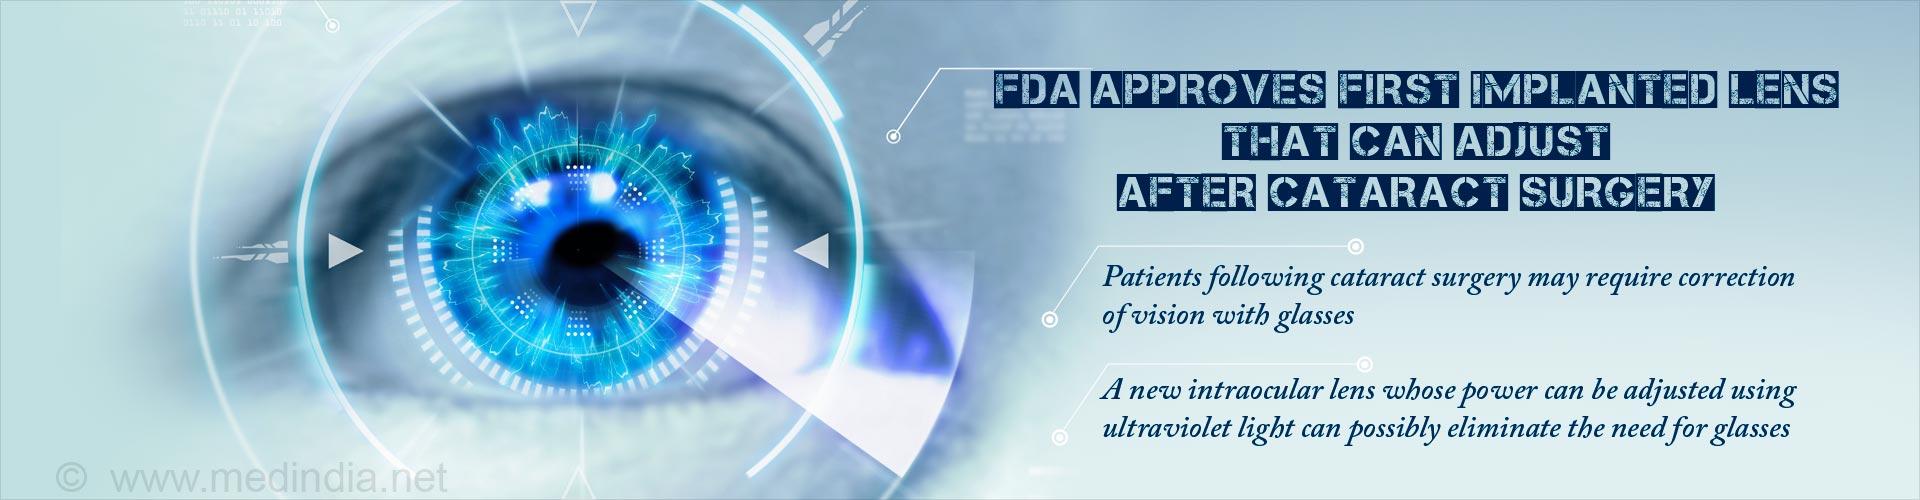 Ultraviolet Light-Sensitive Intraocular Lens can be Adjusted Following Cataract Surgery